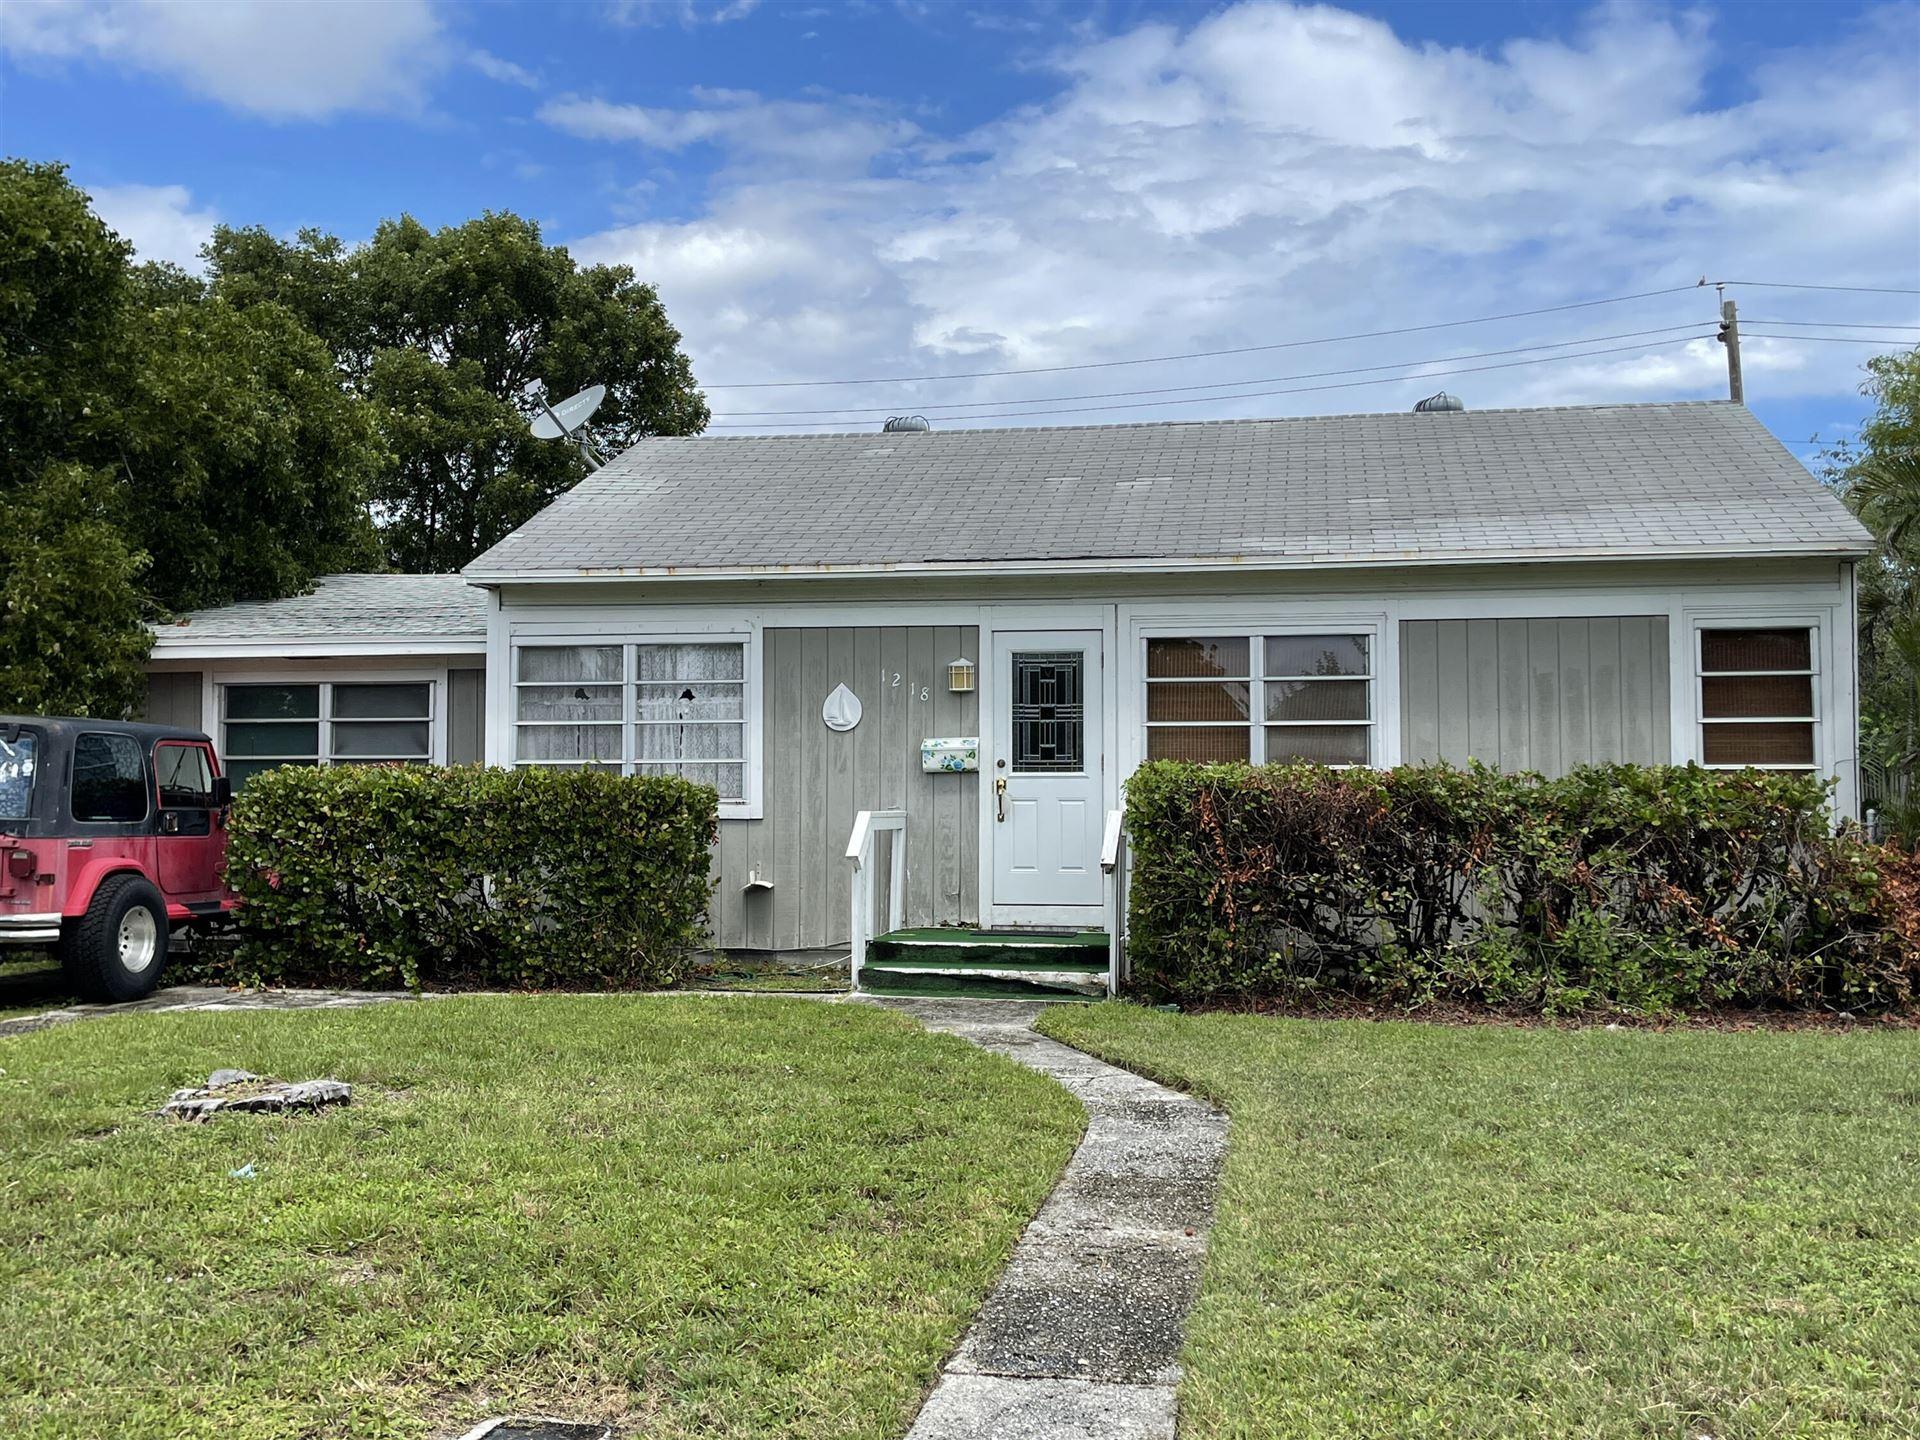 Photo of 1218 13th Avenue N, Lake Worth Beach, FL 33460 (MLS # RX-10747936)